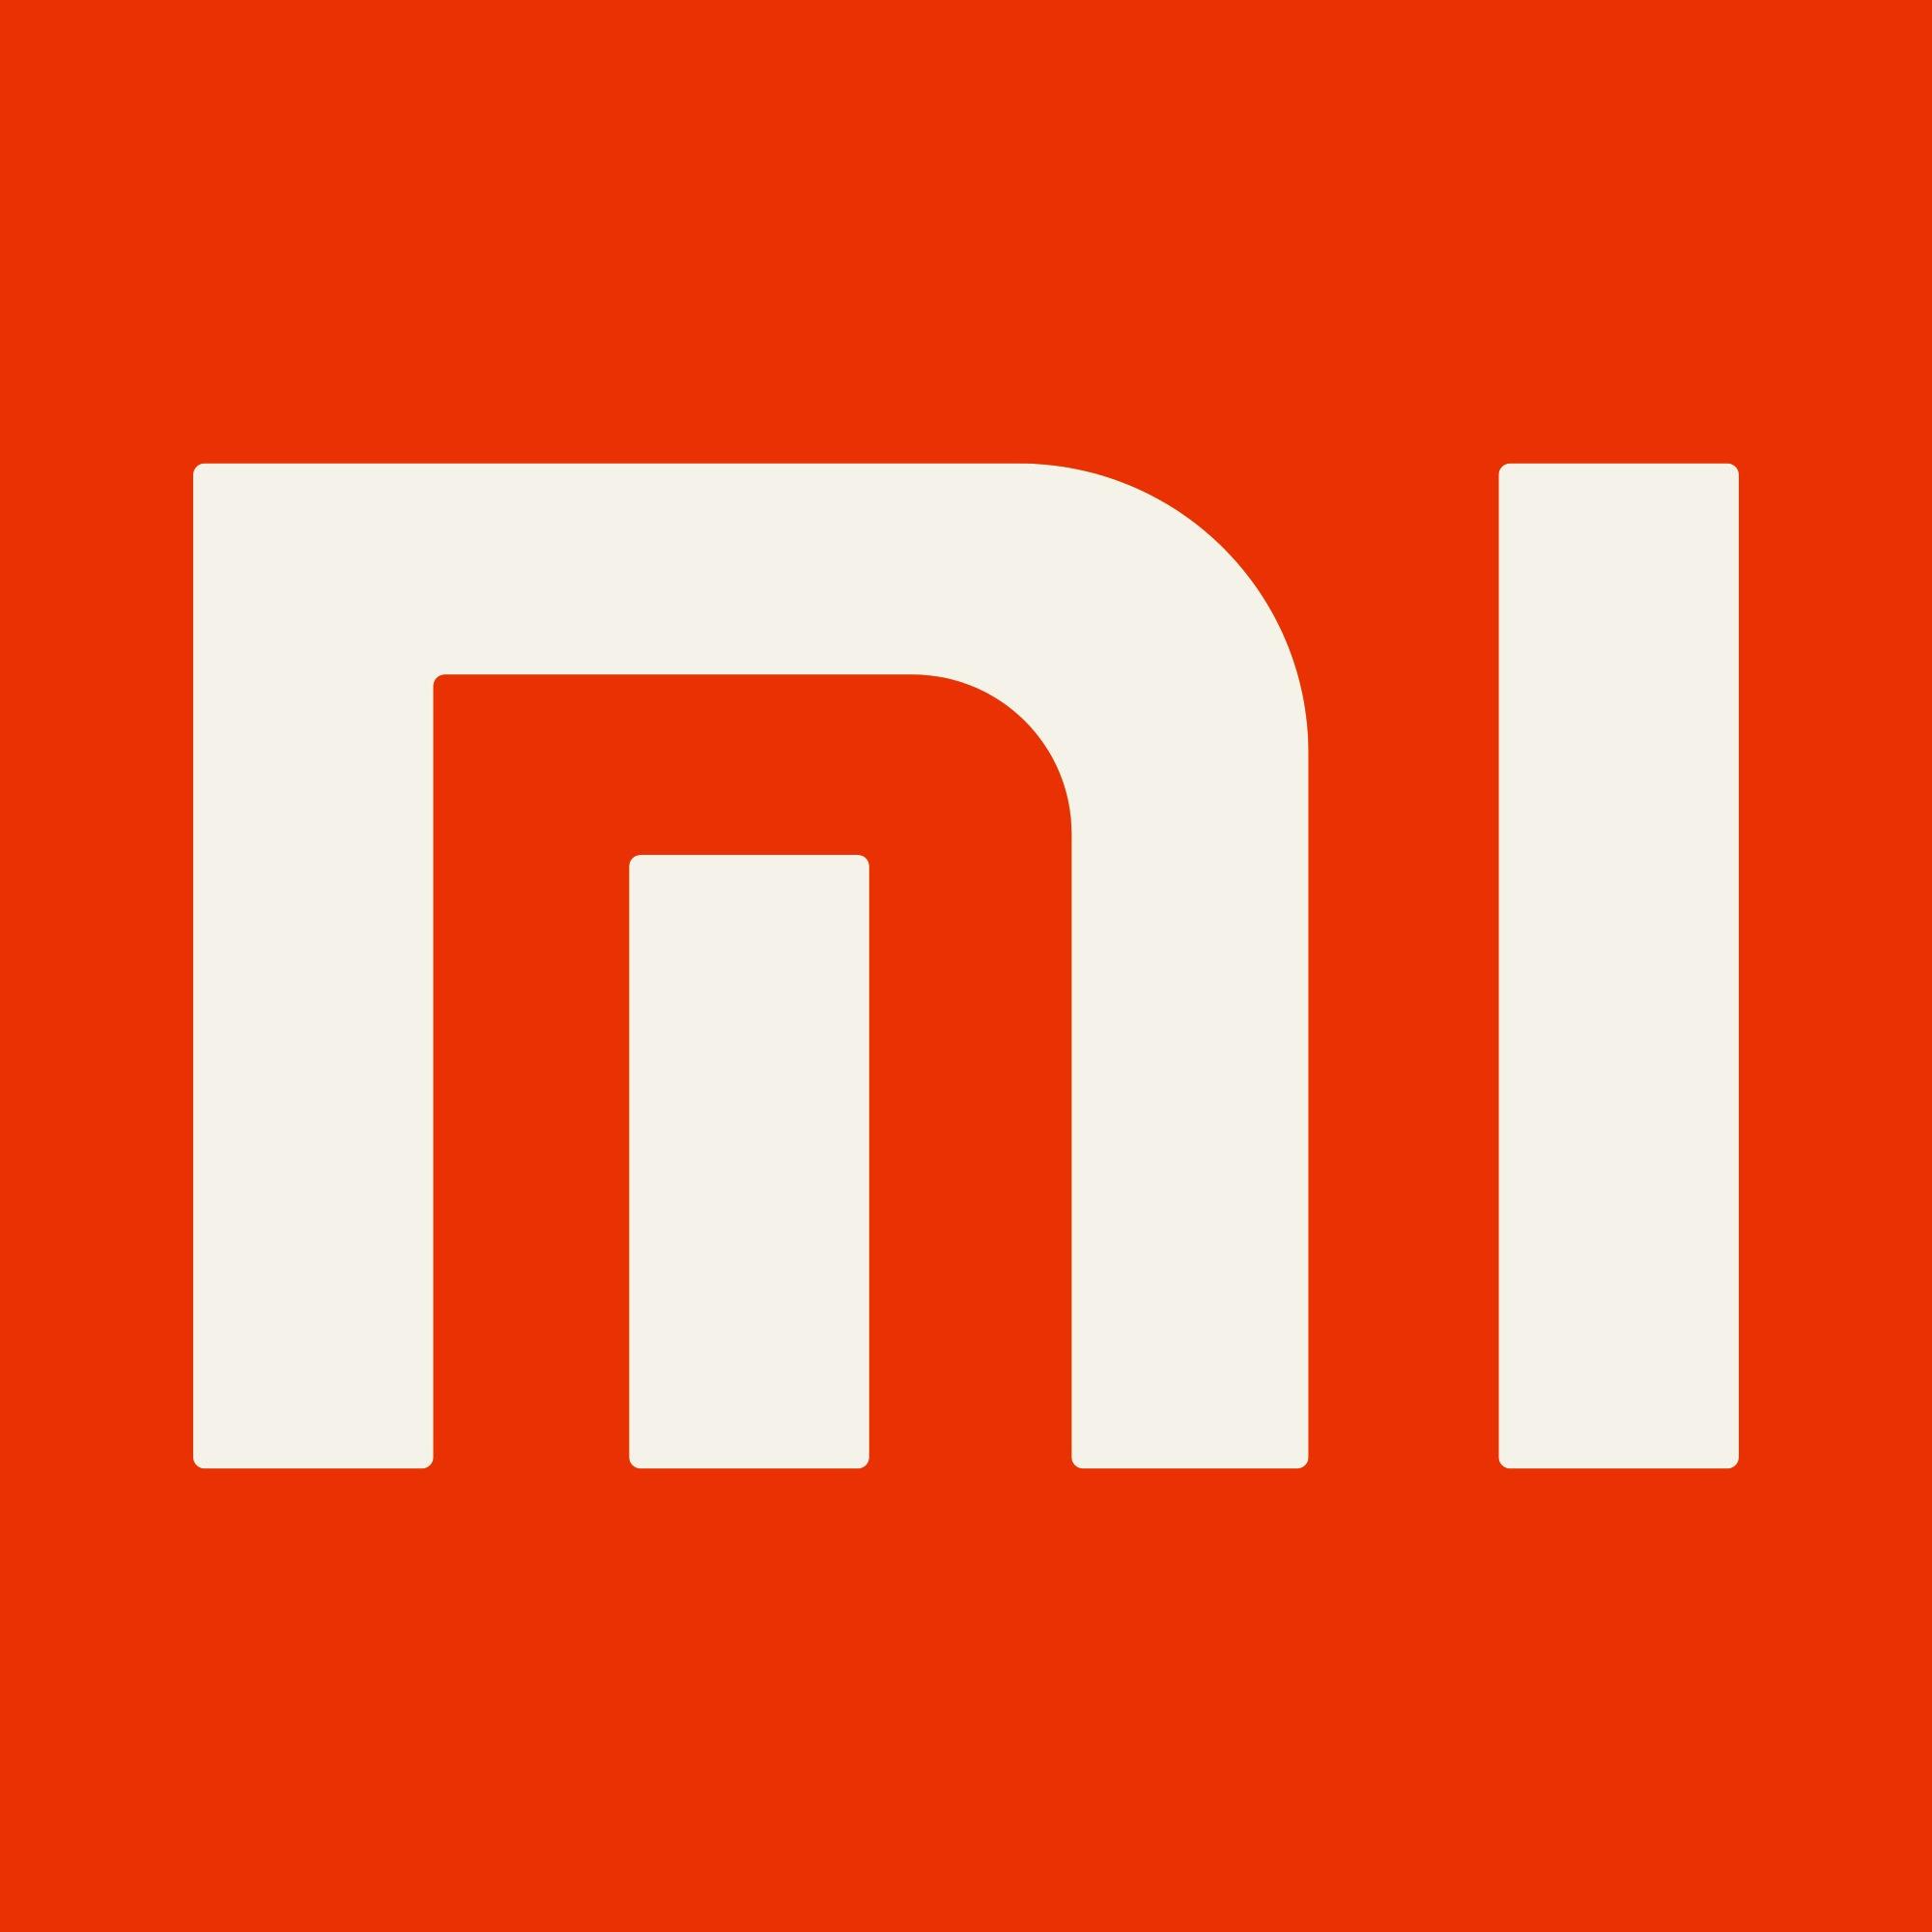 Обзор смартфонов Xiaomi Black Shark 3 и Xiaomi Black Shark 3 Pro